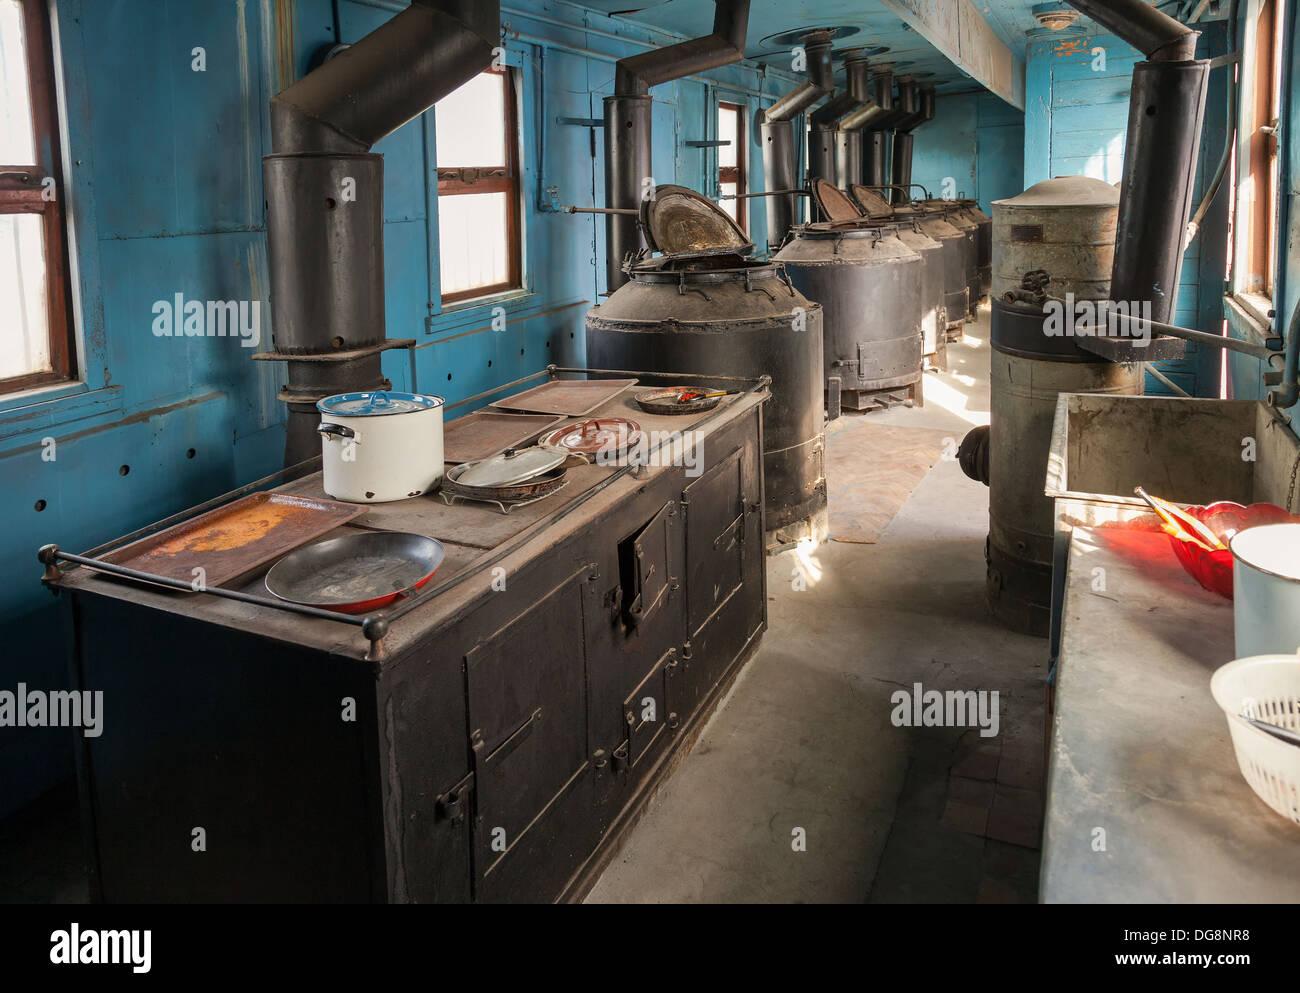 Interior of old railway wagon kitchen - Stock Image